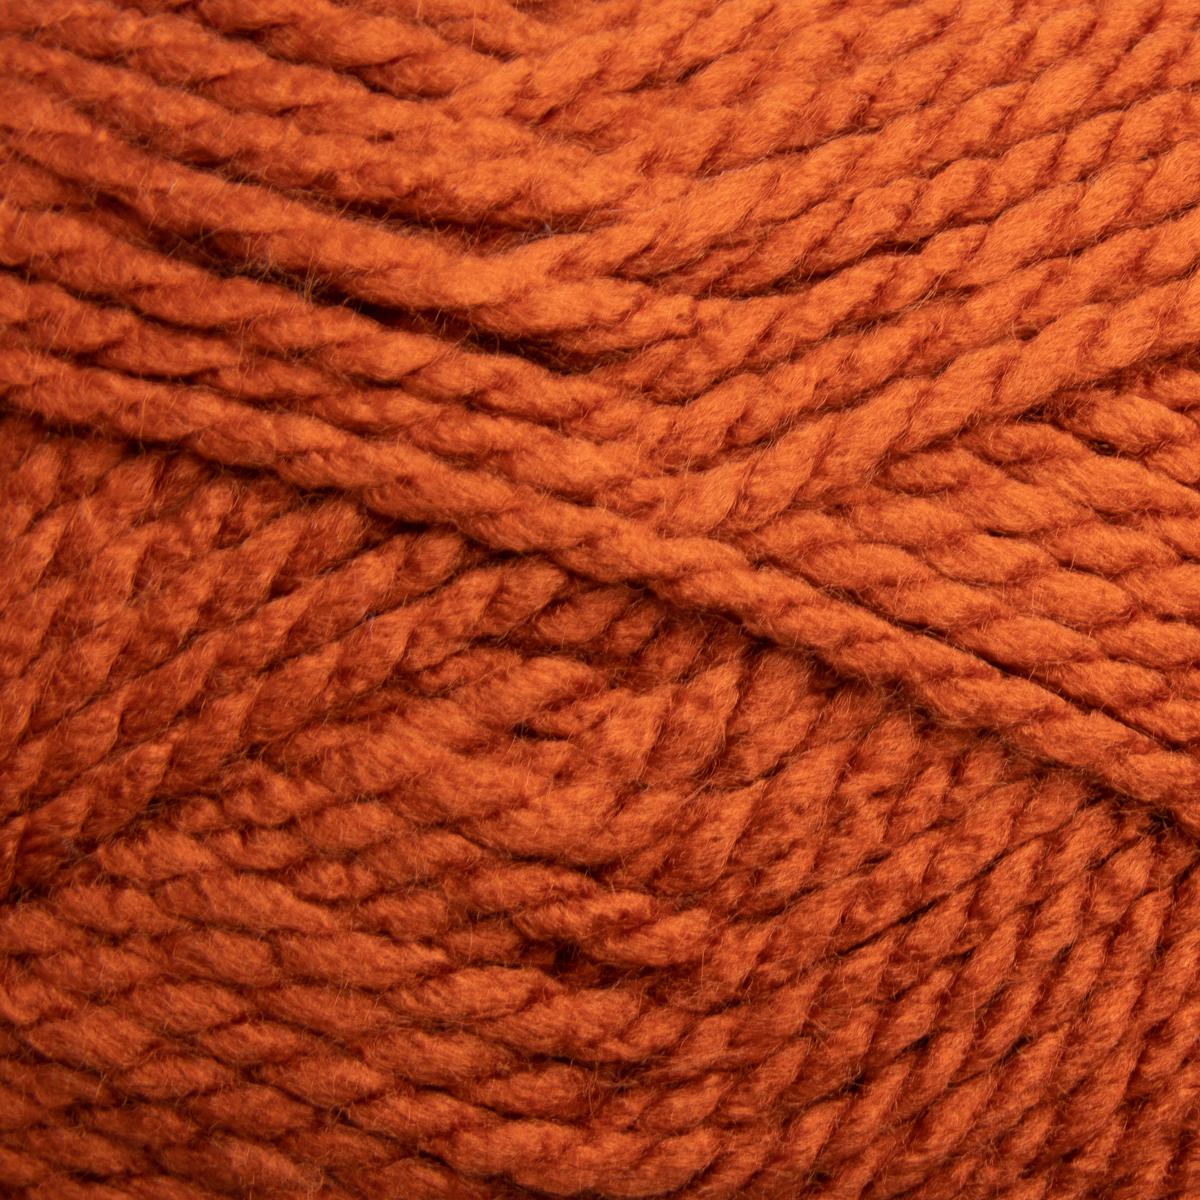 3pk-Premier-Yarns-Deborah-Norville-Serenity-100-Acrylic-Yarn-Chunky-5-Knitting thumbnail 85